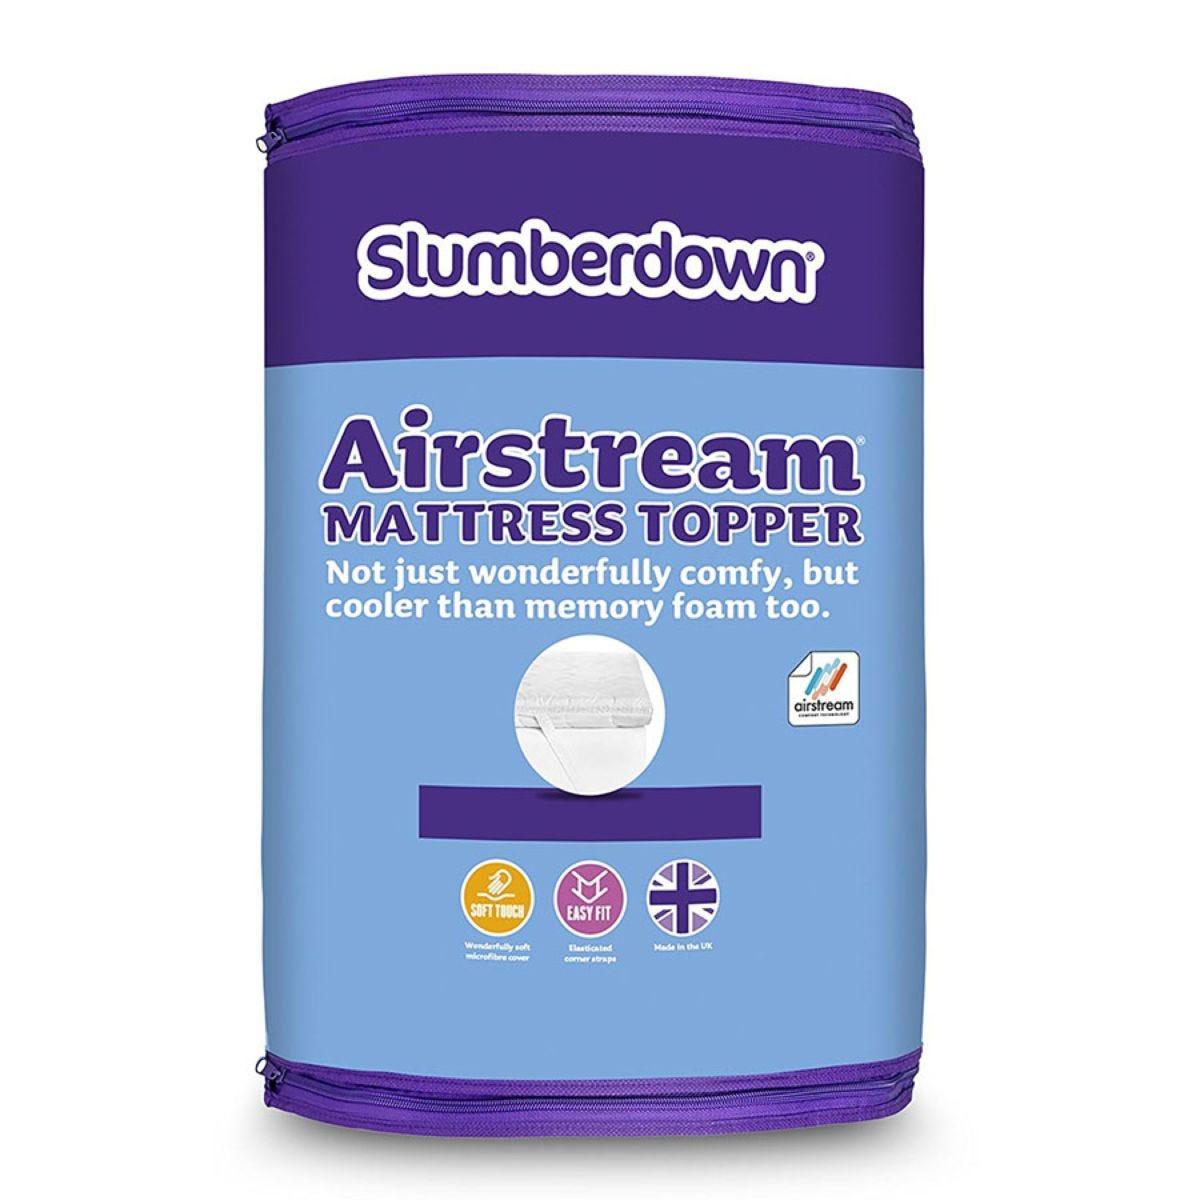 Slumberdown Airstream Mattress Topper